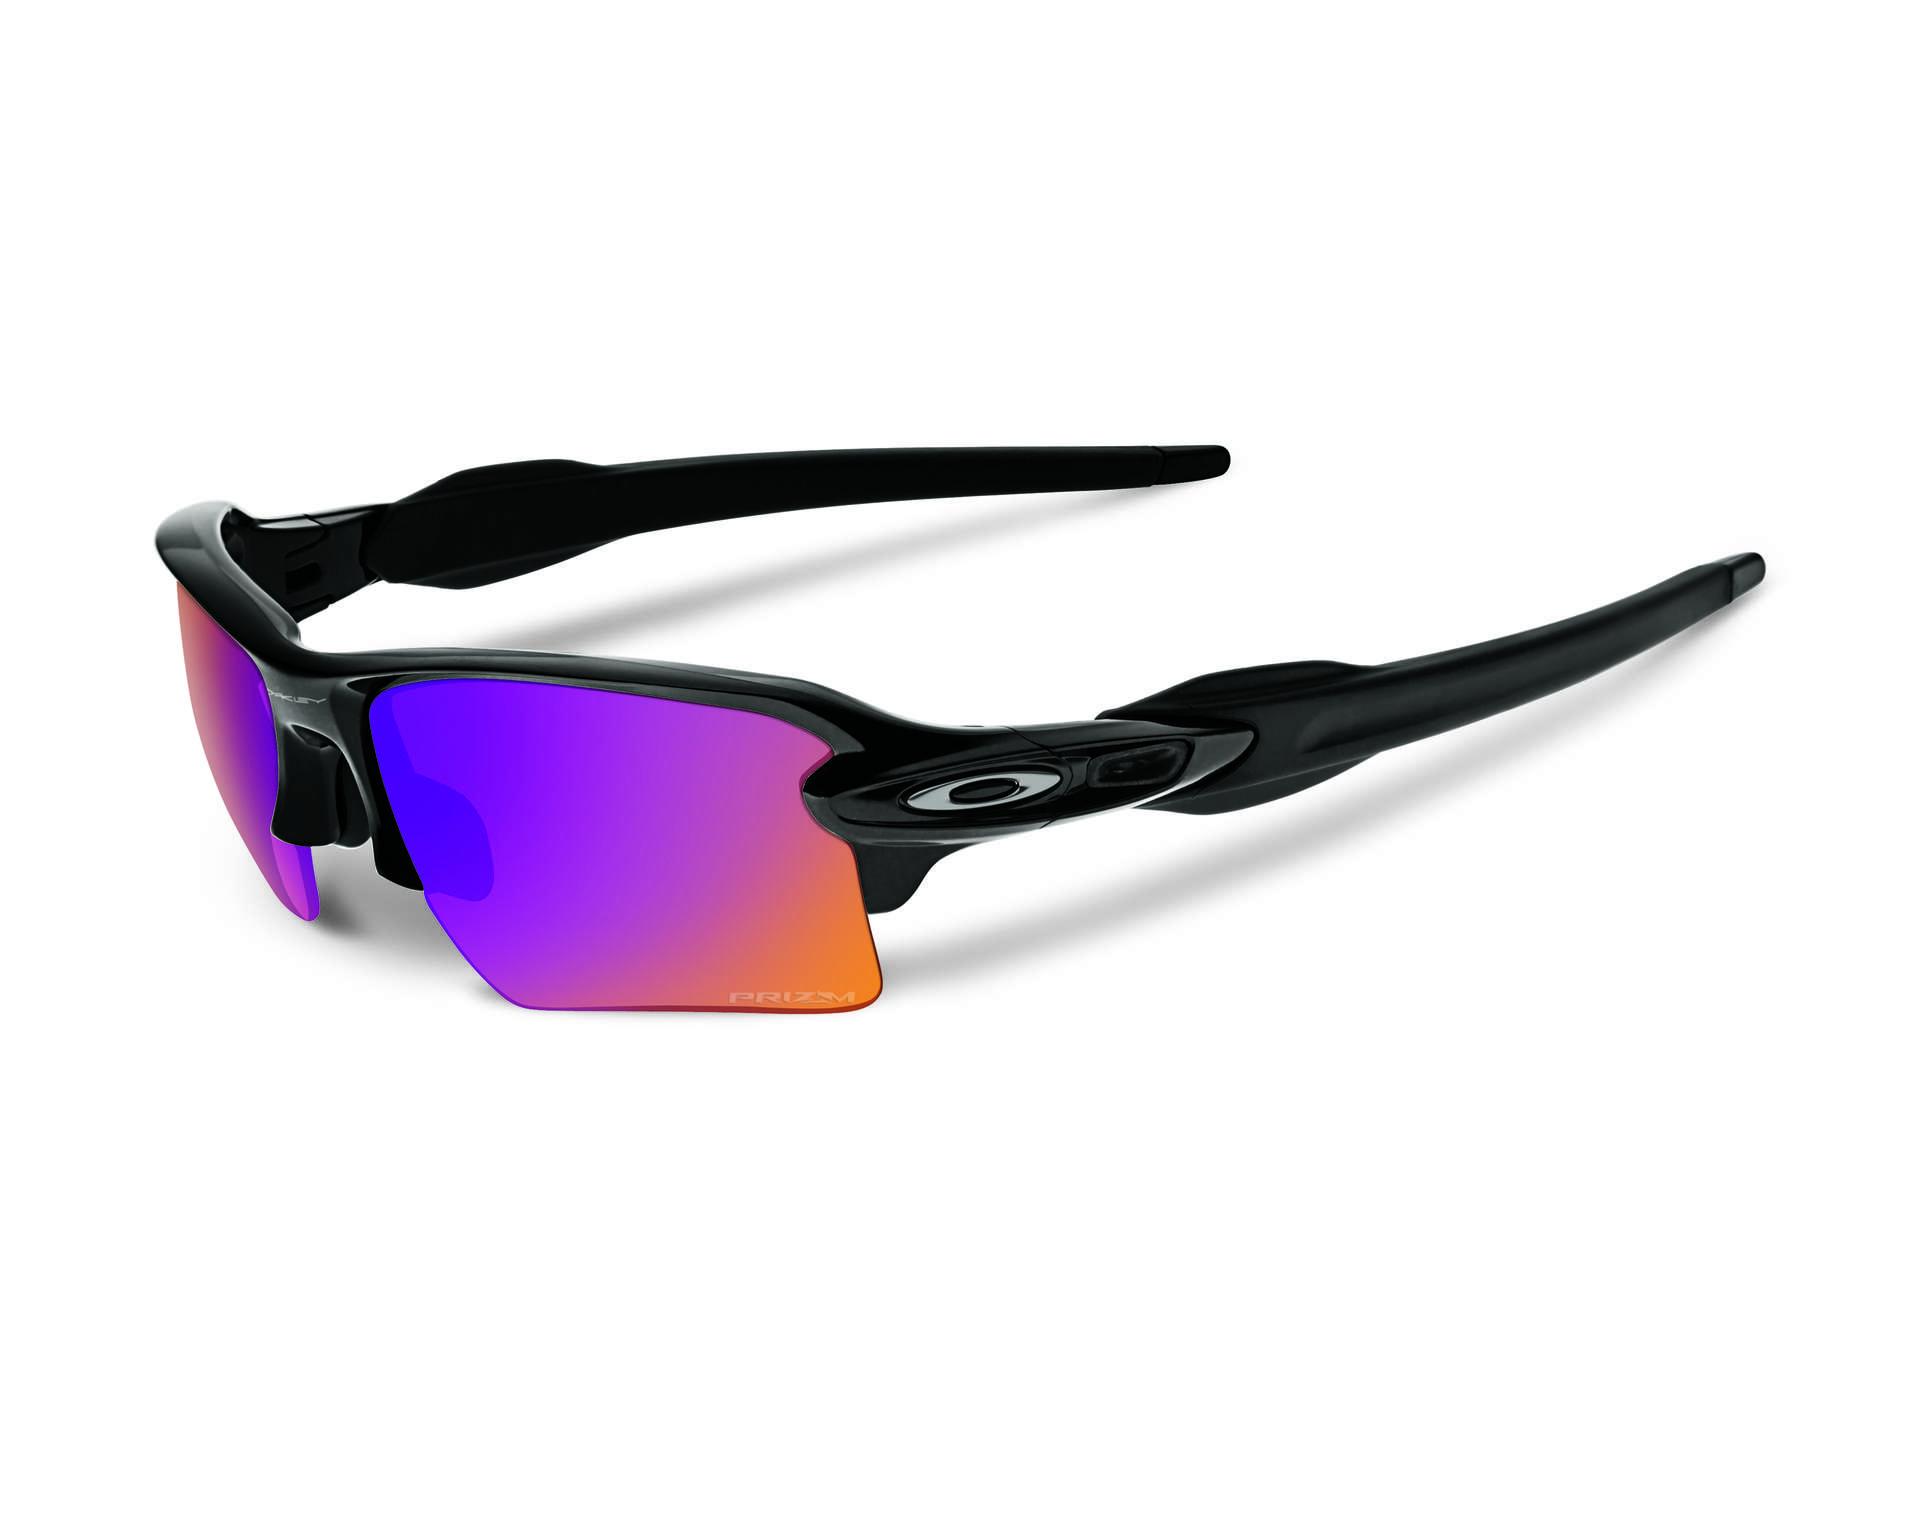 Je Lens Oakley 0 2 Trail Xl Zonnebril Zwart Flak Heren Prizm Koop qBTq8wP